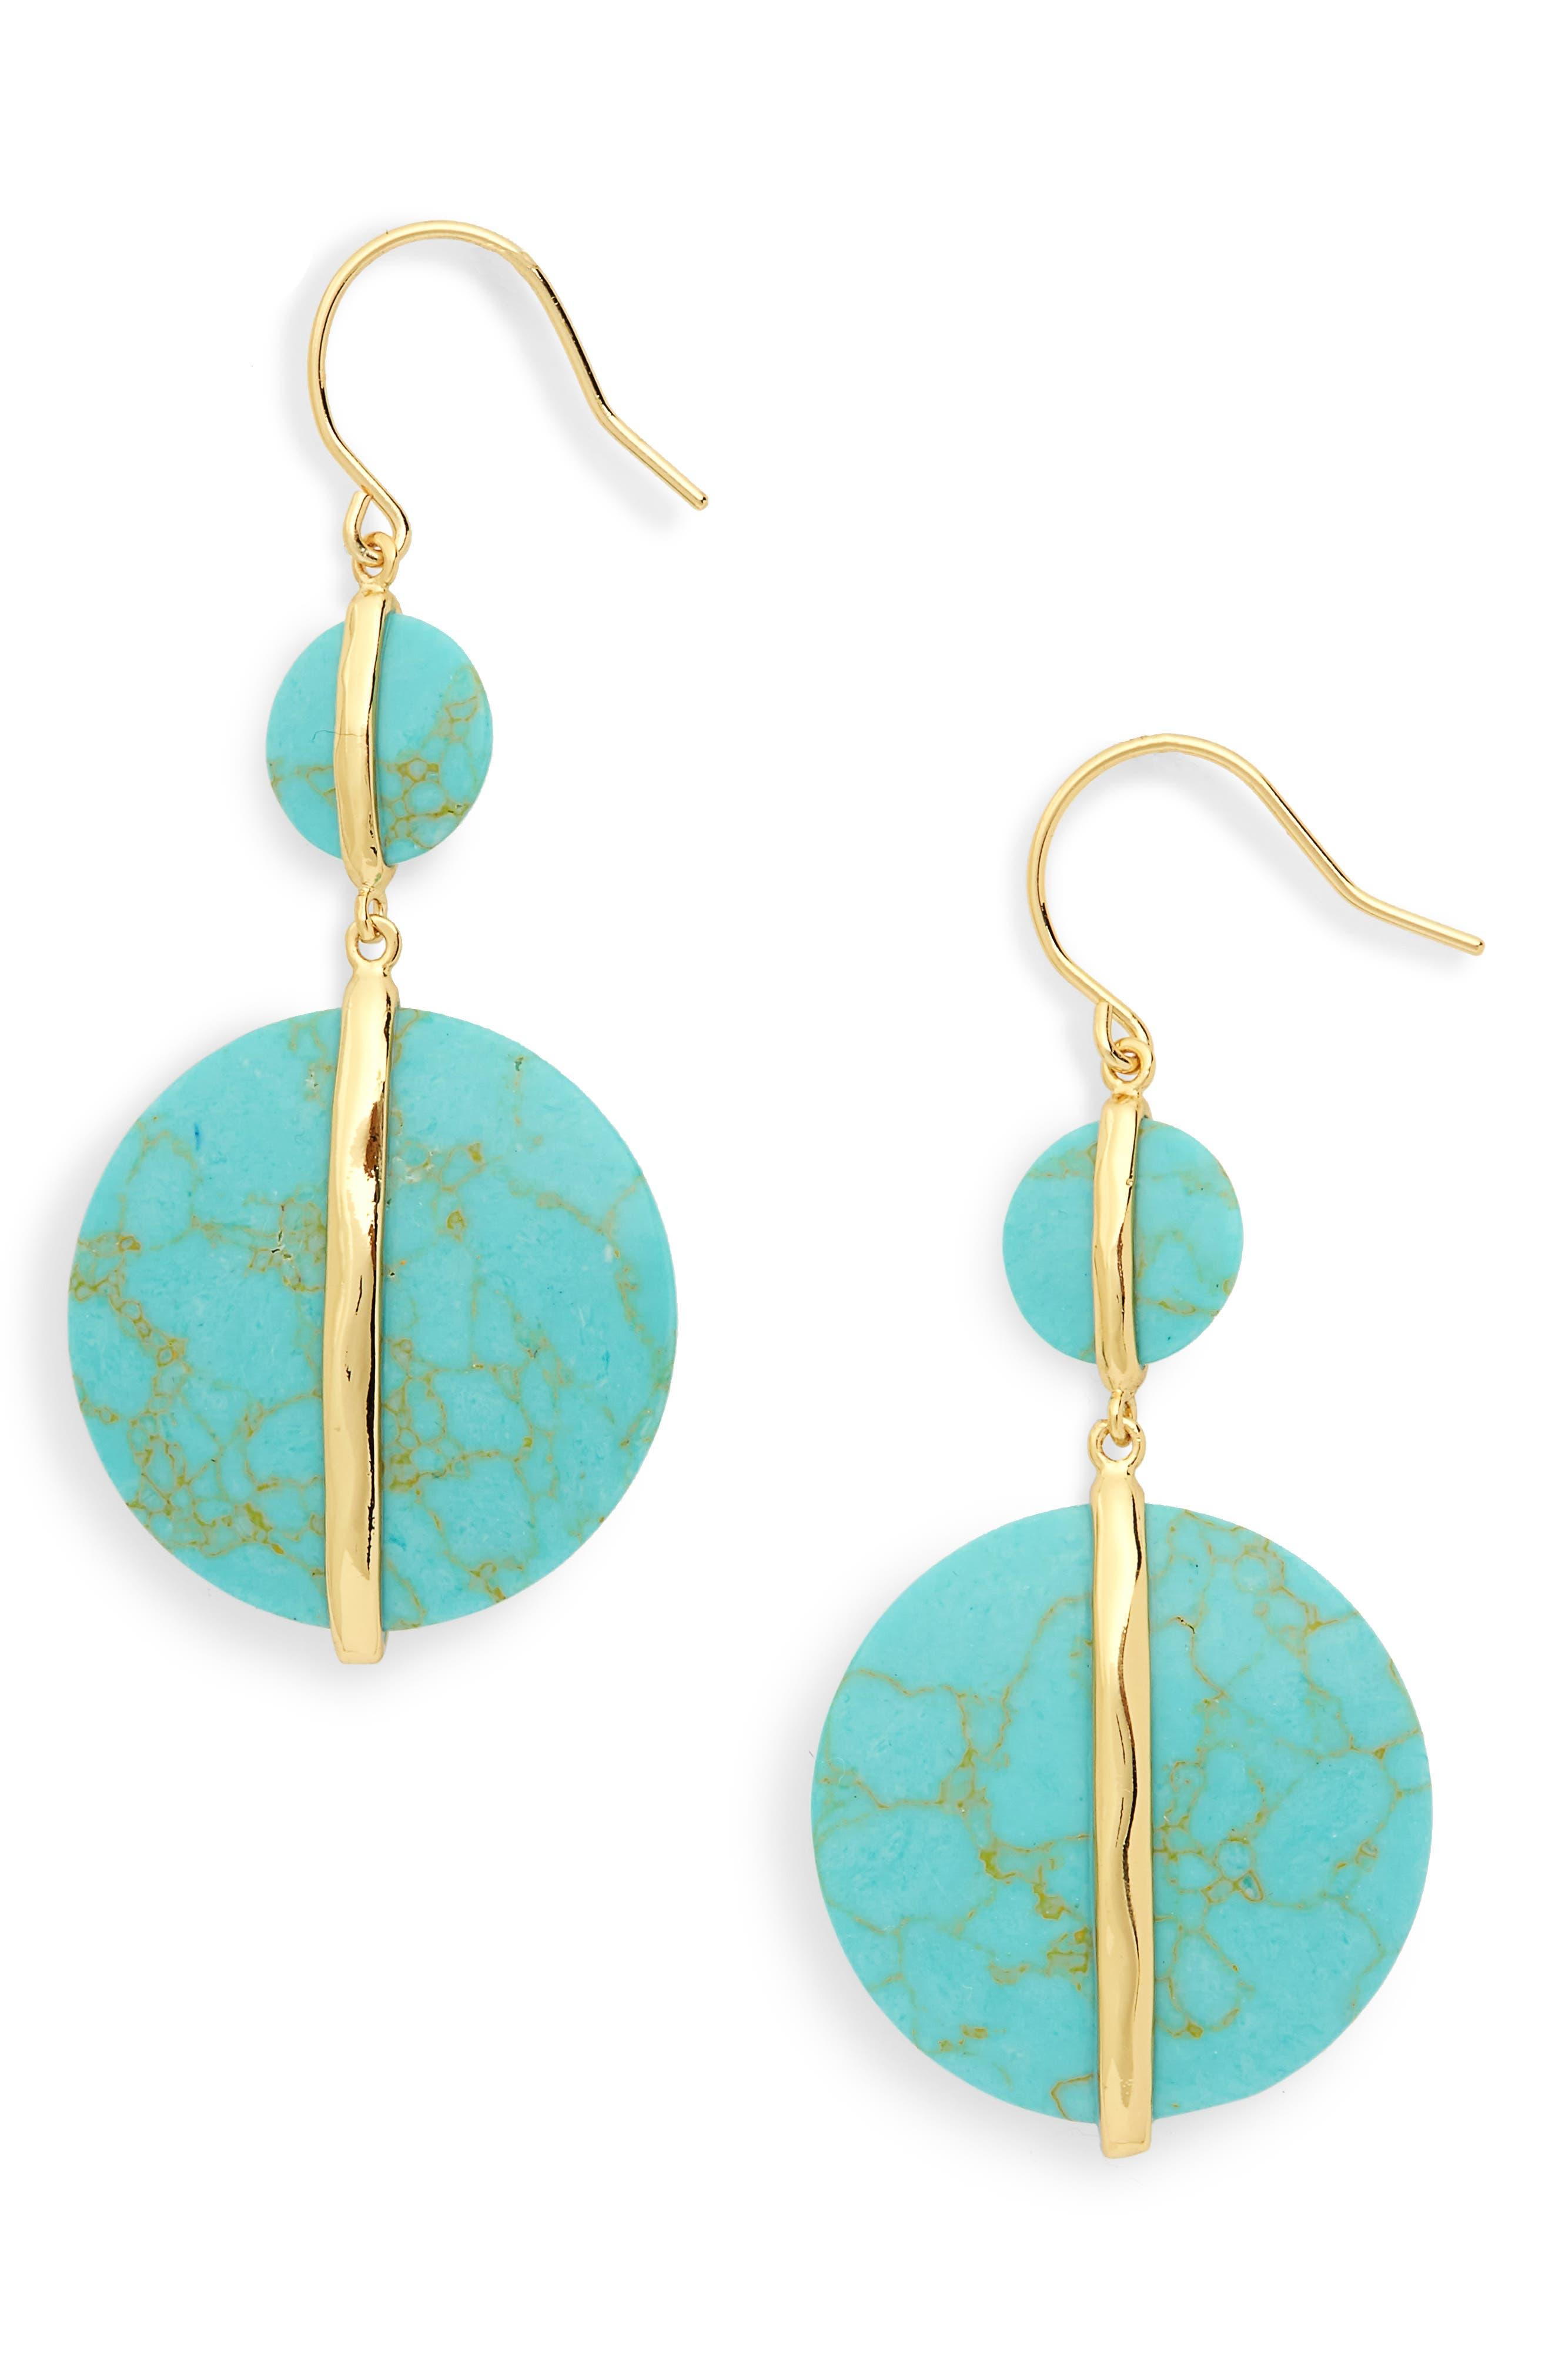 Brinn Drop Earrings,                             Main thumbnail 1, color,                             Green Turquoise